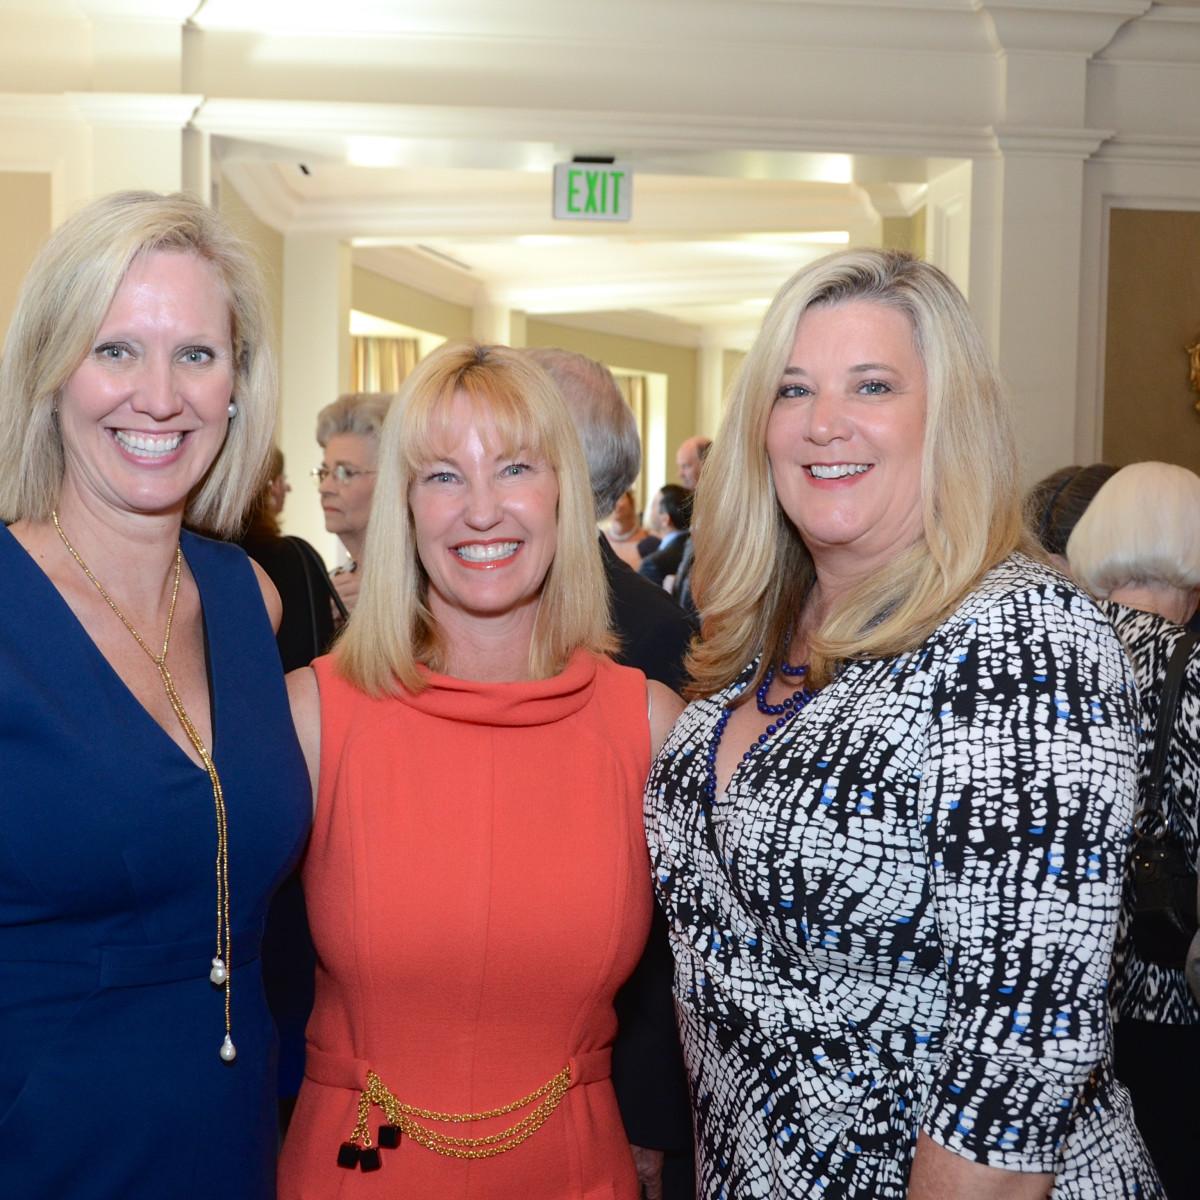 The Center luncheon, Feb. 2016, Pam Lewis, Christy Galtney, Tricia Streitmann